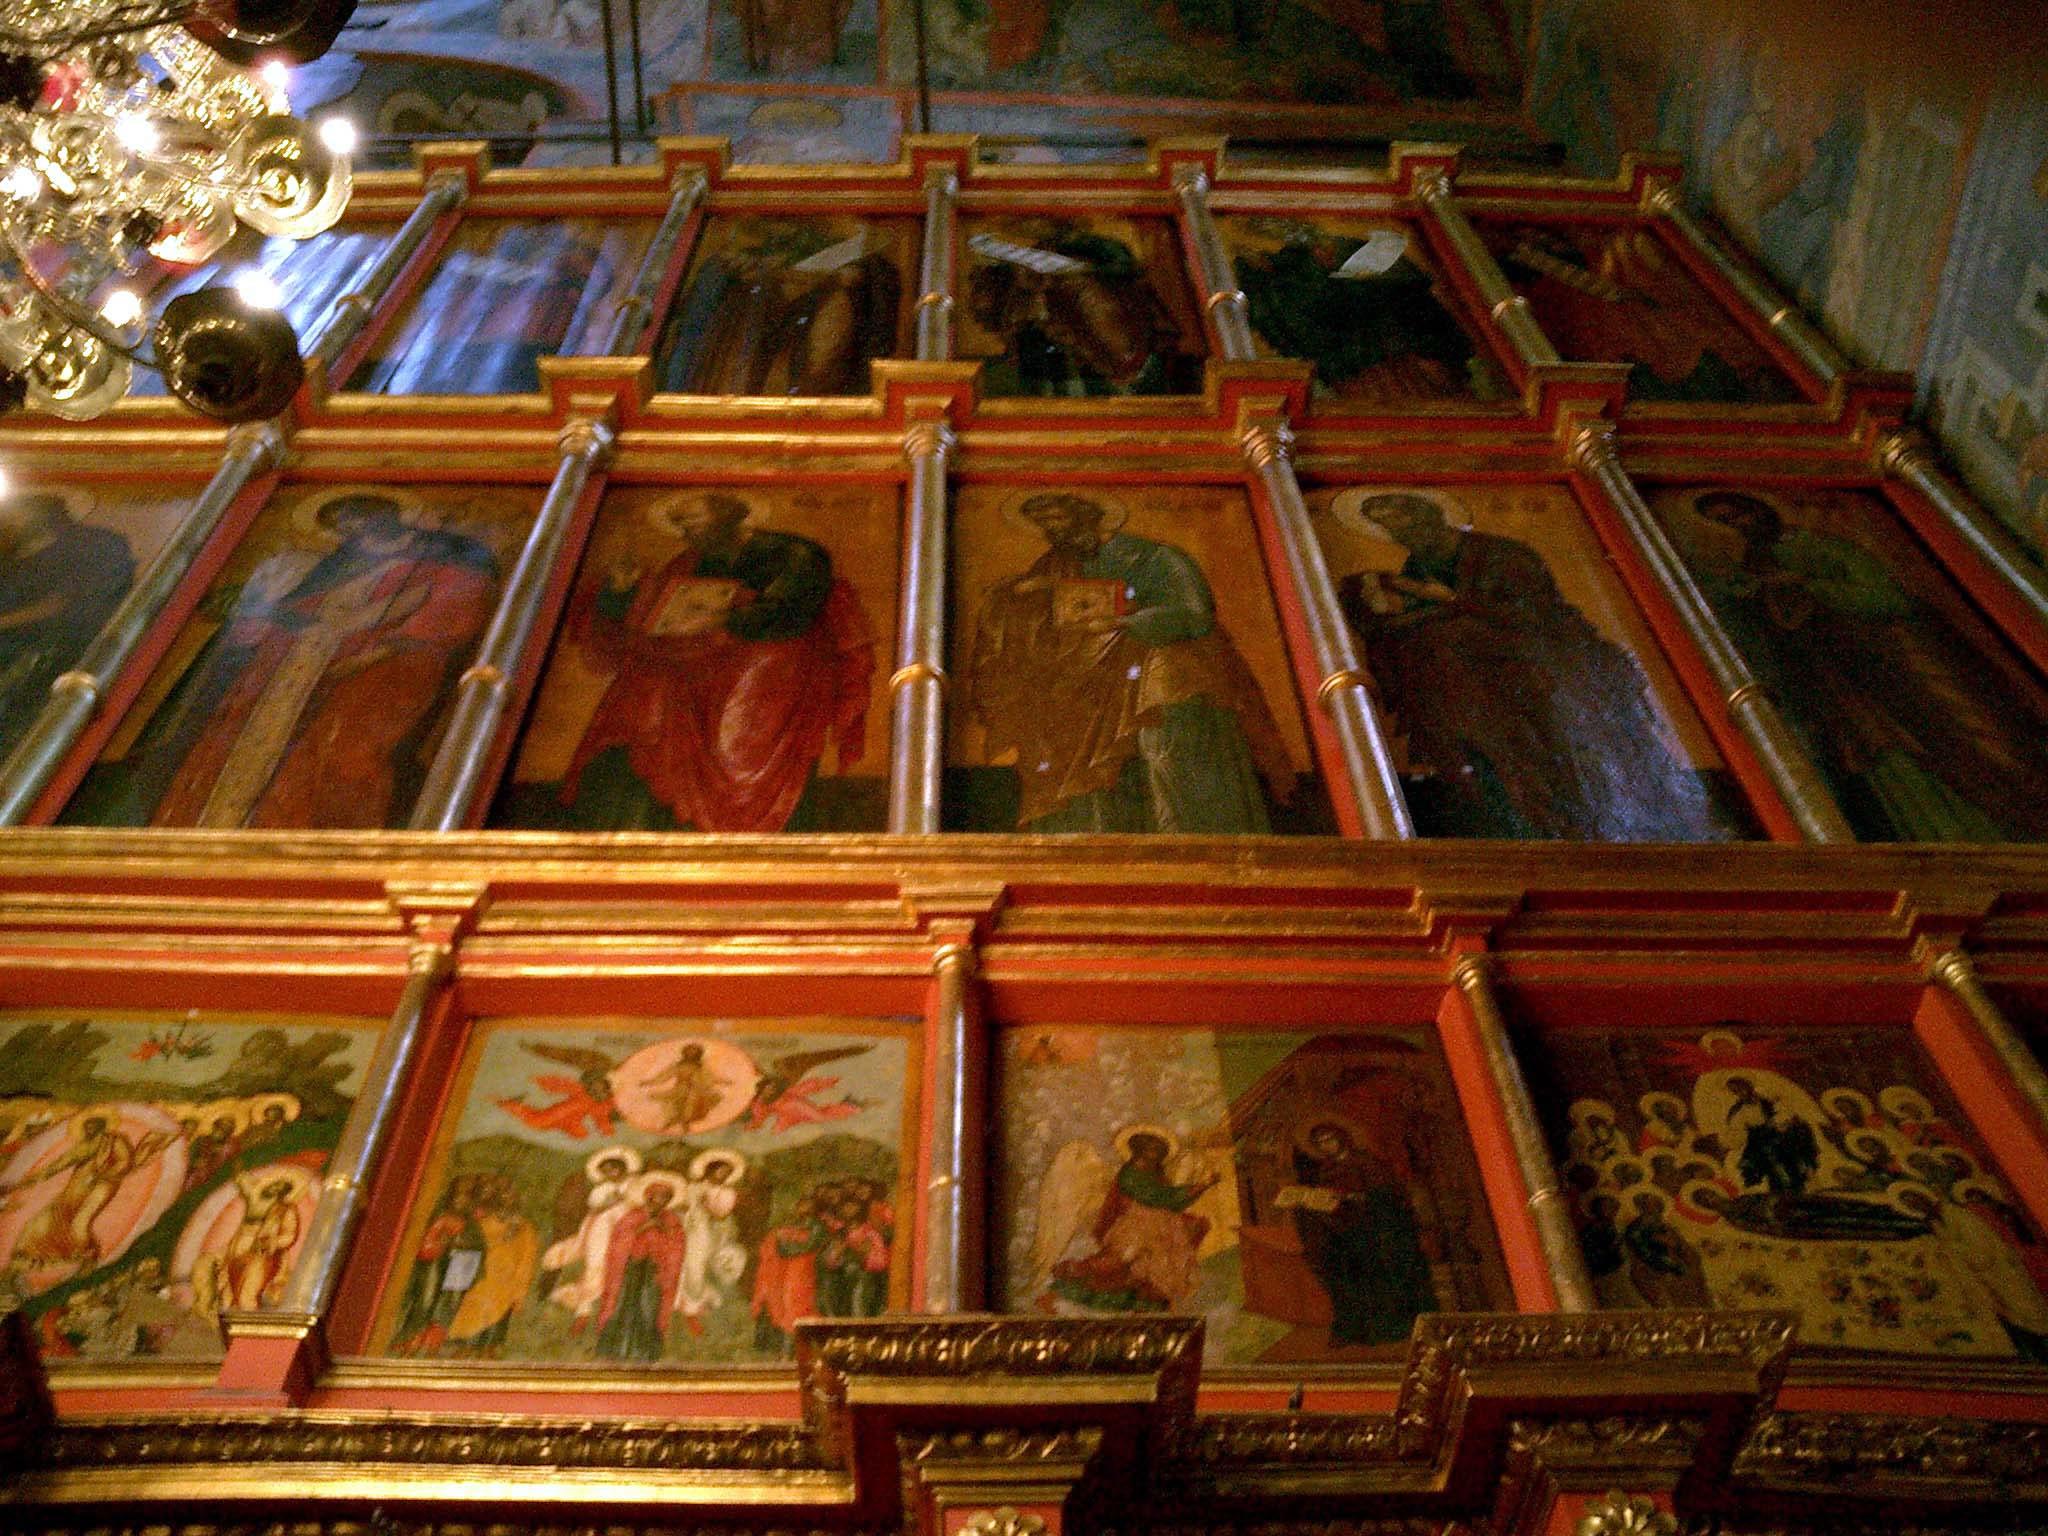 Moscow Kremlin Patriarchs Palace Church of 12 Apostles 2005 08